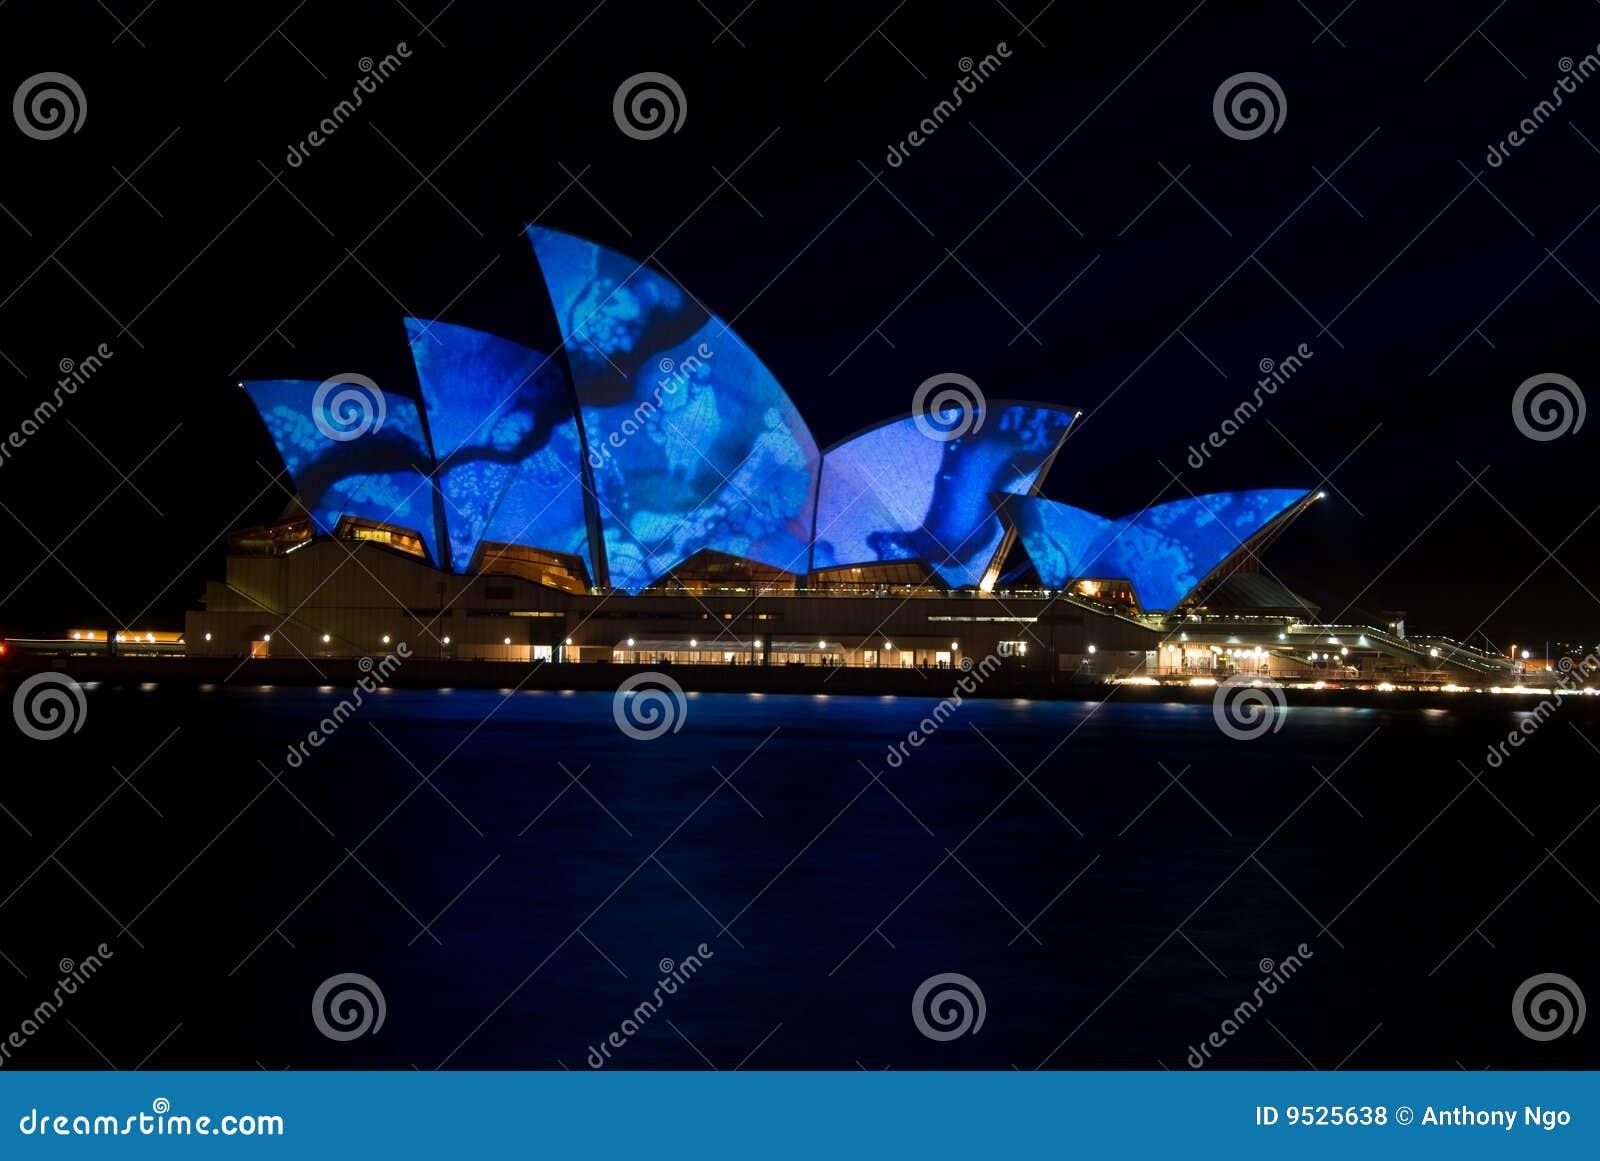 Creative Luminous Lighting Sydney Opera House